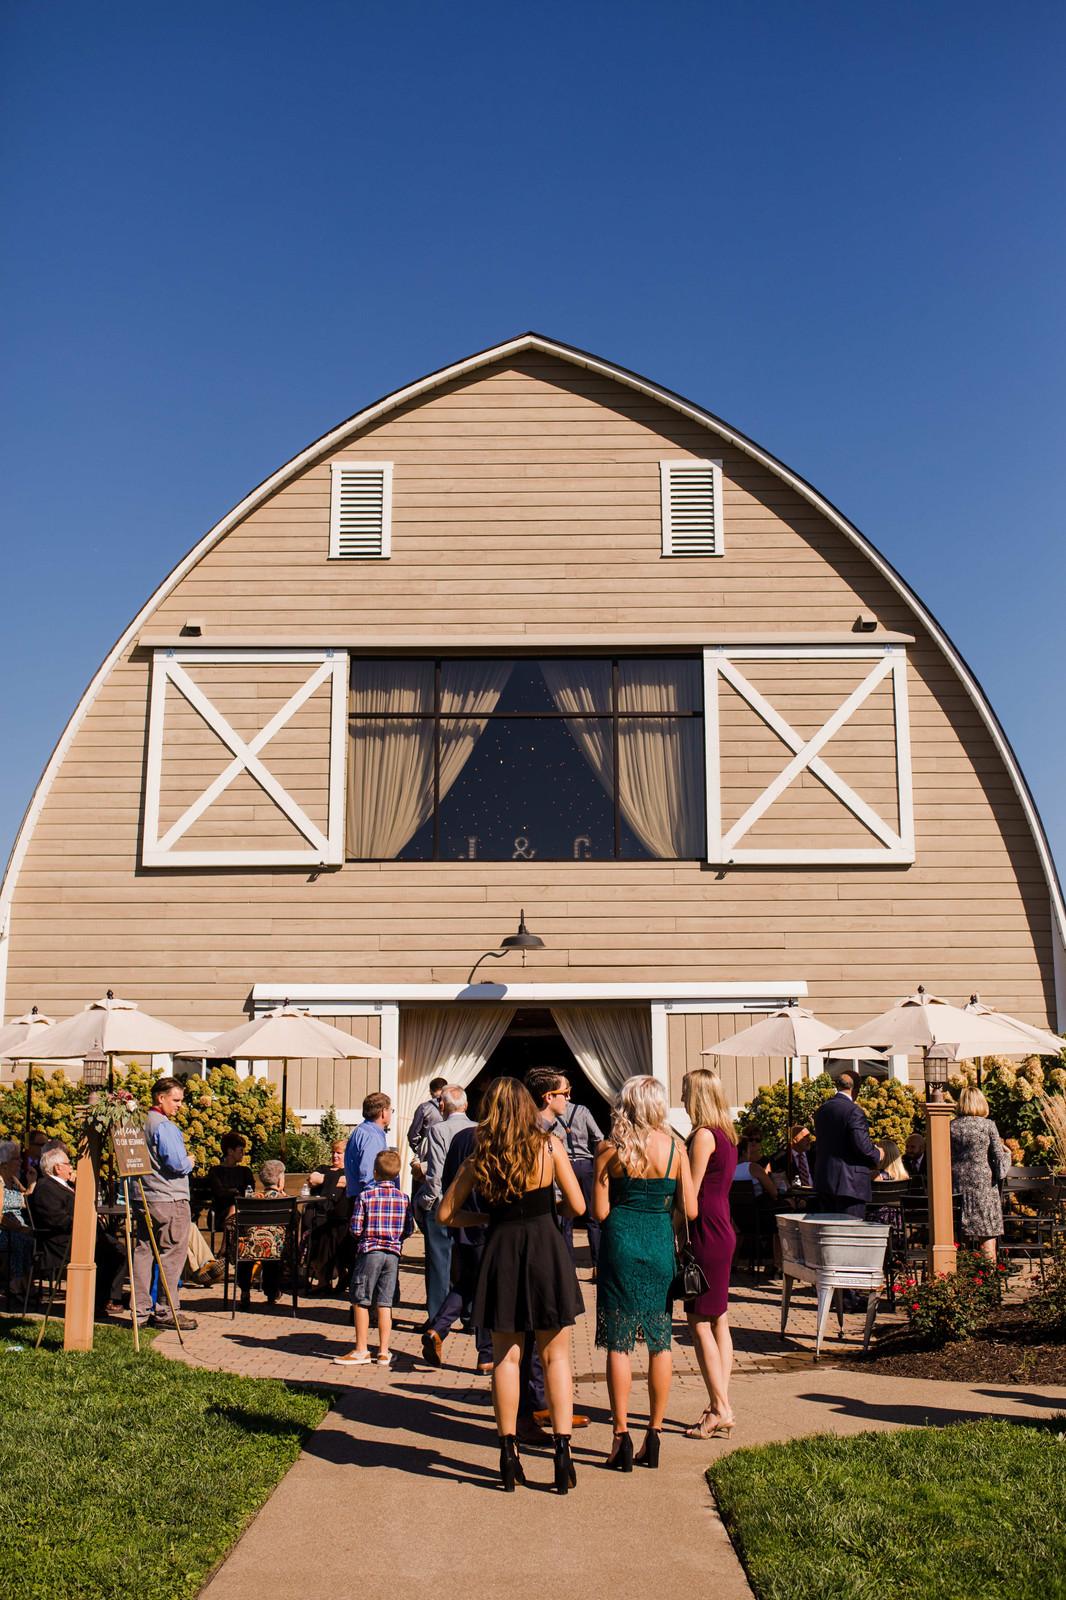 Irons Mill Farmstead Weddings   Barn Wedding Venue   New ...